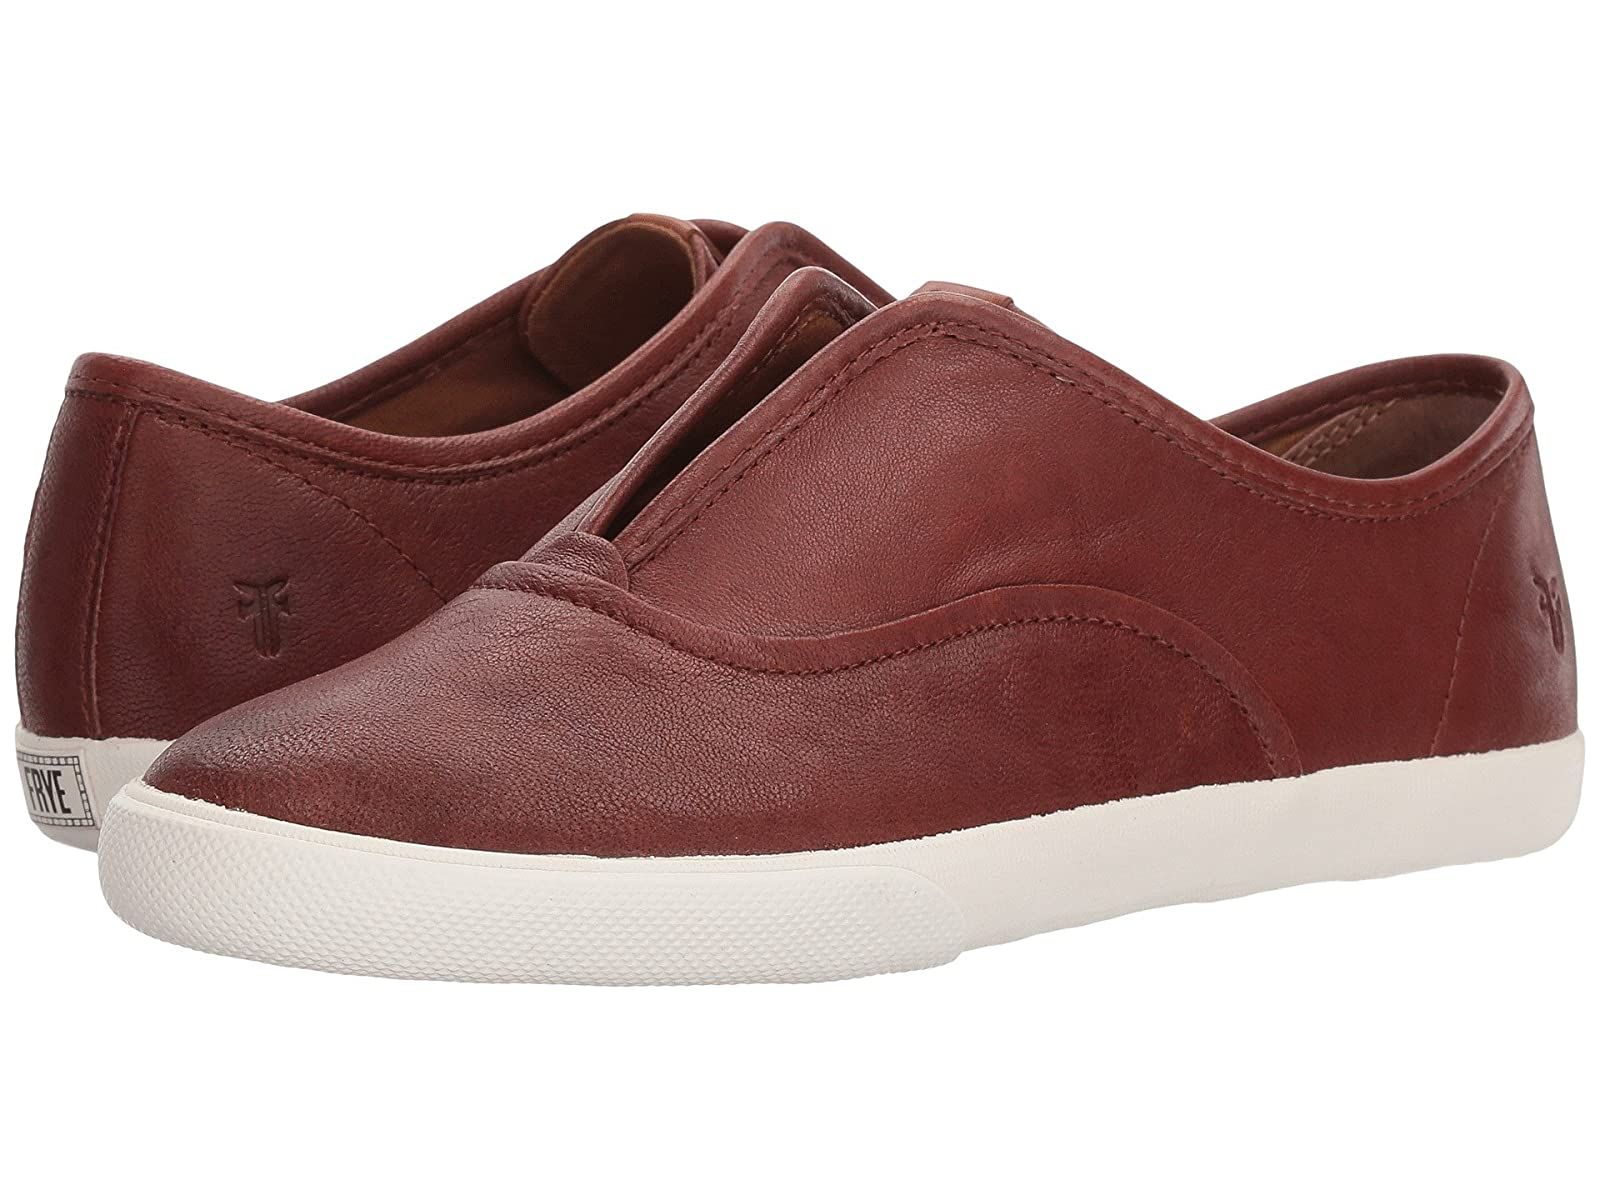 Frye Maya CVO Slip-OnAtmospheric grades have affordable shoes